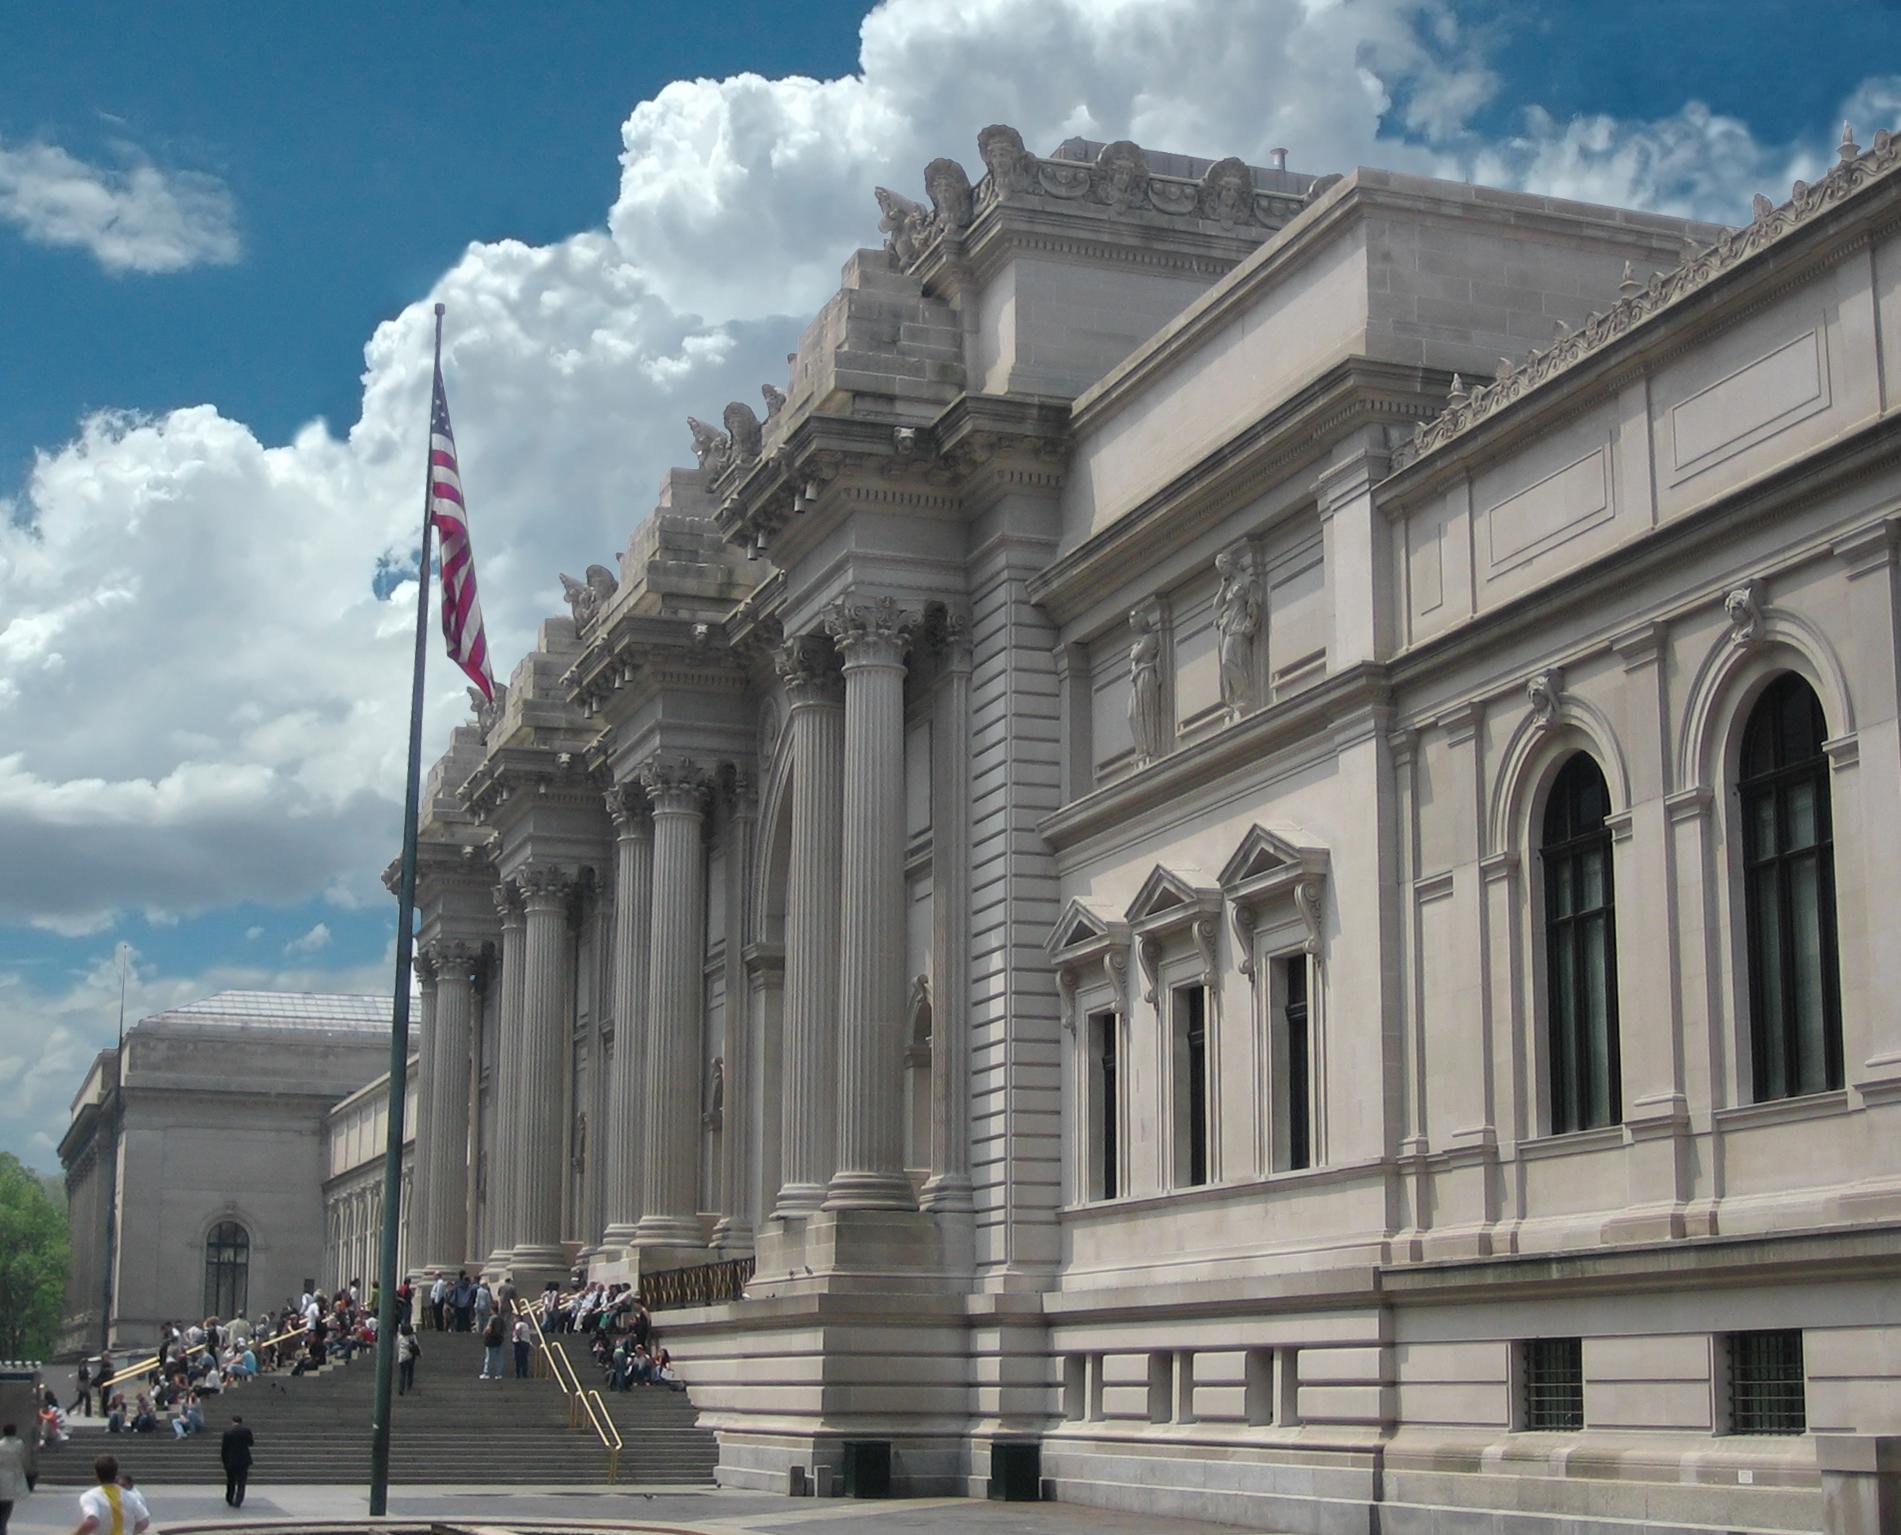 Metropolitan Museum of Art, 2007. Foto Arad, gebouw, exterieur, ingang